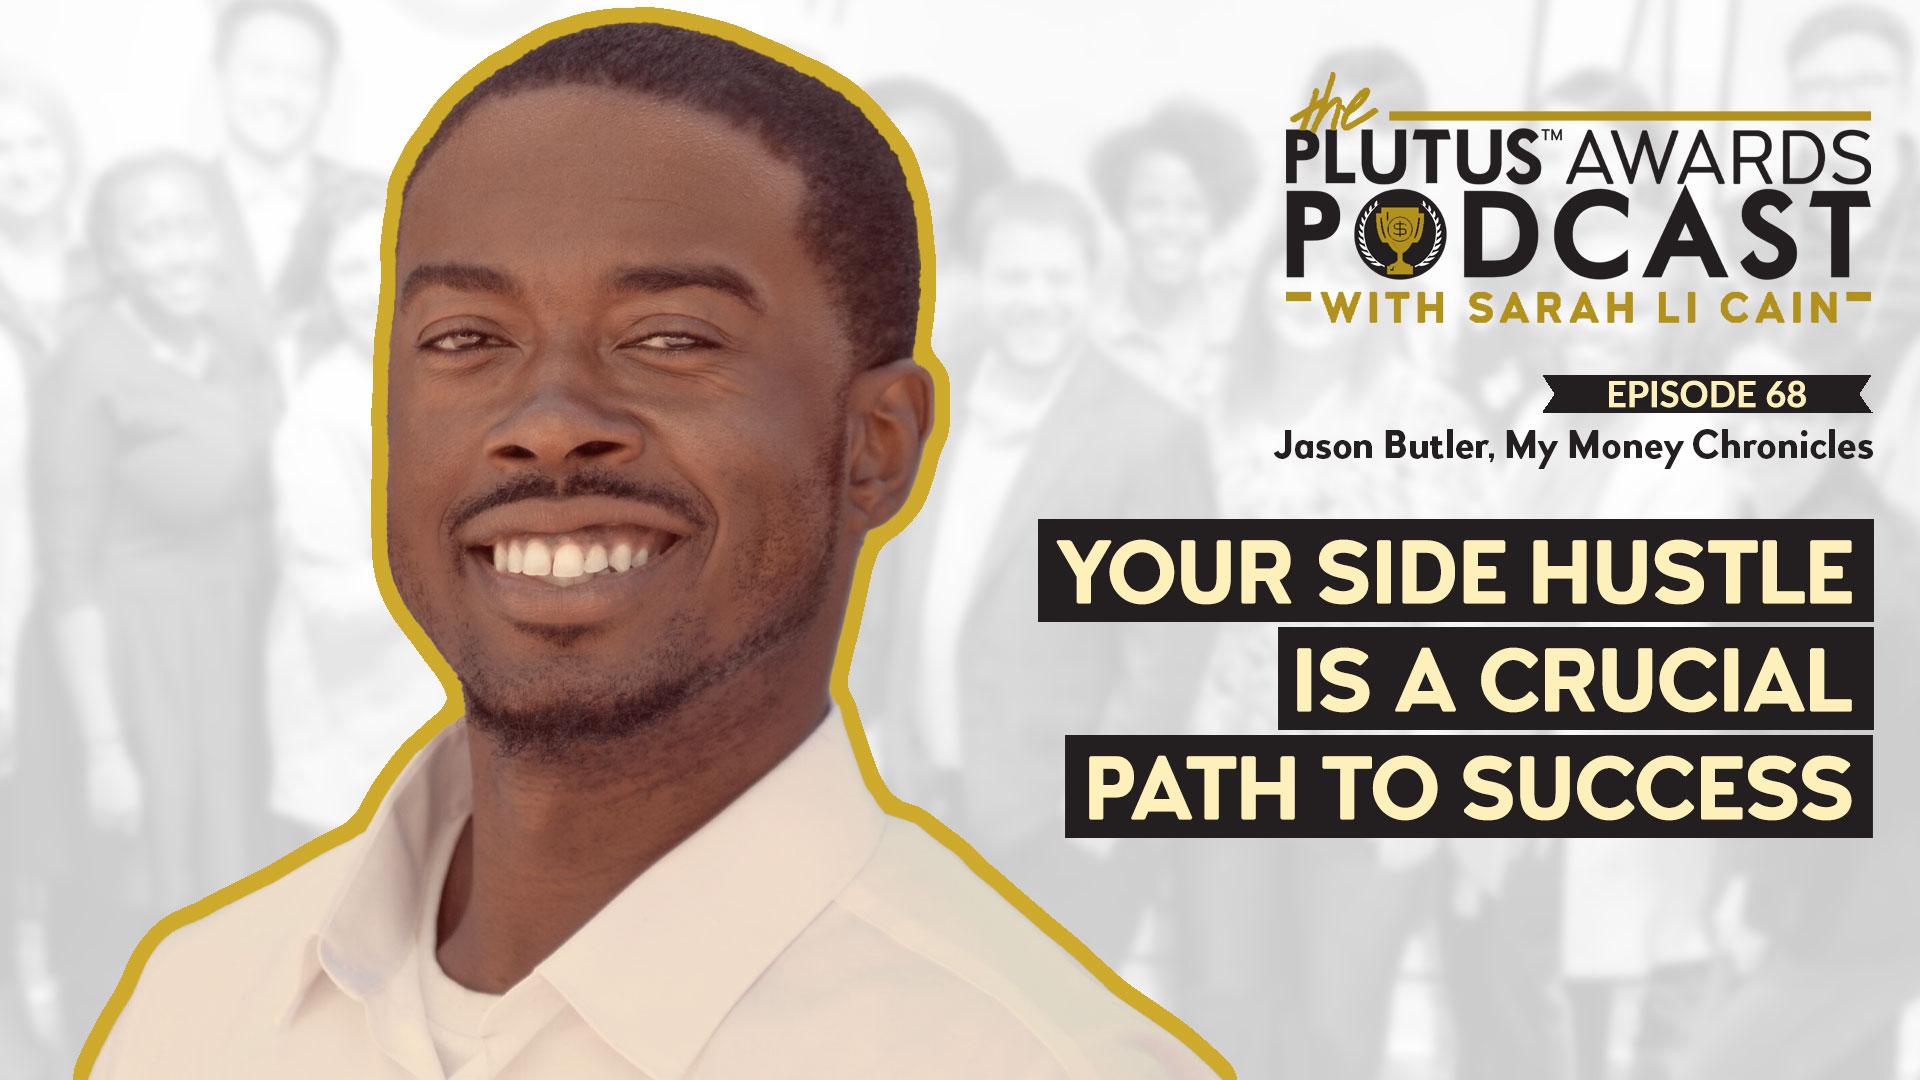 Plutus Awards Podcast - Jason Butler Featured Image